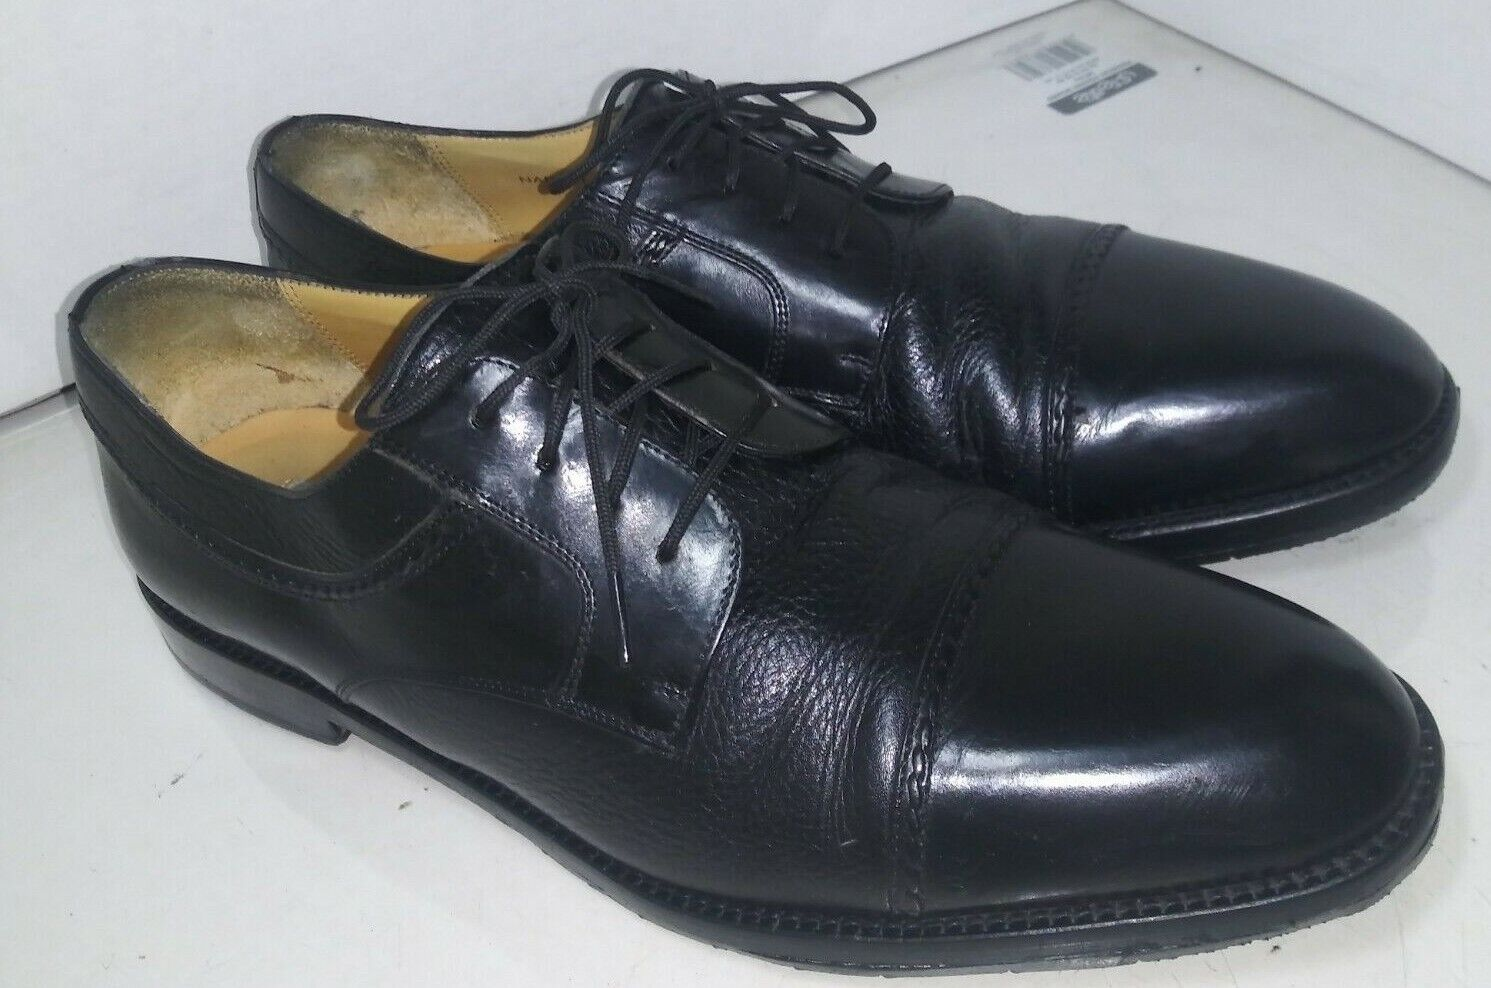 Mezlan Napoli Black Leather Dress Oxford shoes Cap Toe Men Size 11.5 M